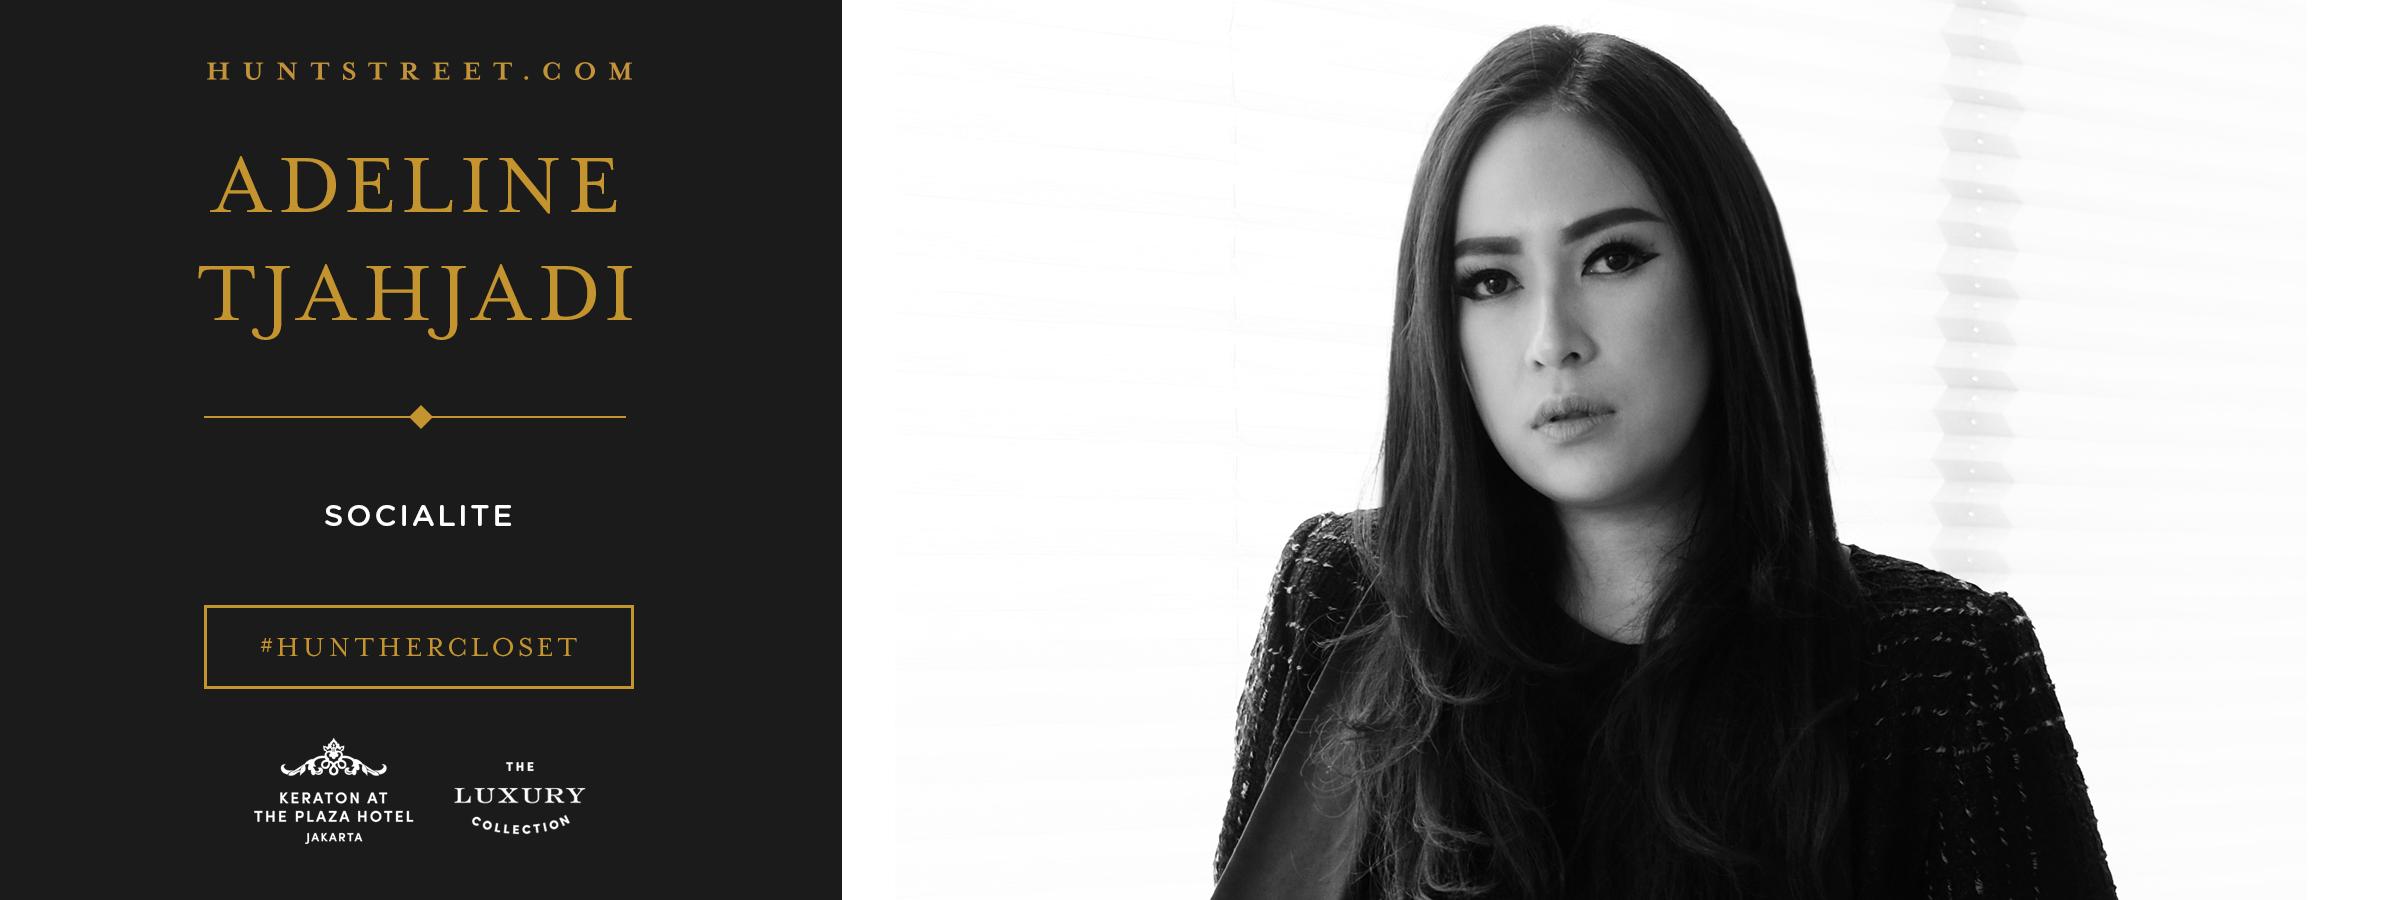 #HUNTHERCLOSET: Adeline Tjahjadi